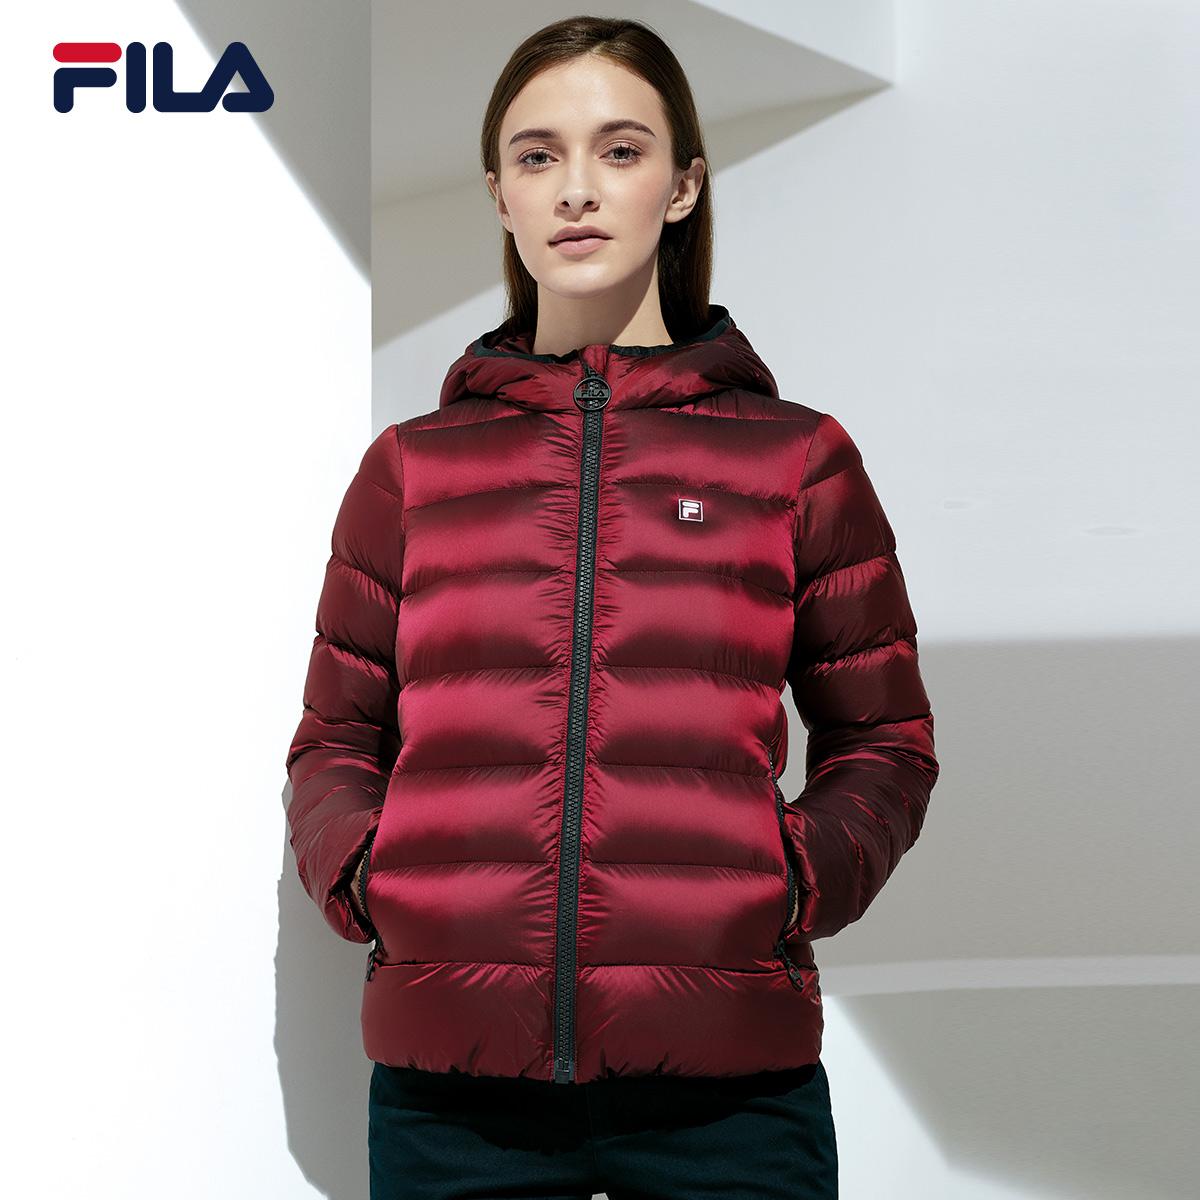 e8b499c3f06b 1fila Fei Le female down jacket 2018 Winter new hooded sports jacket female  warm wind down jacket female